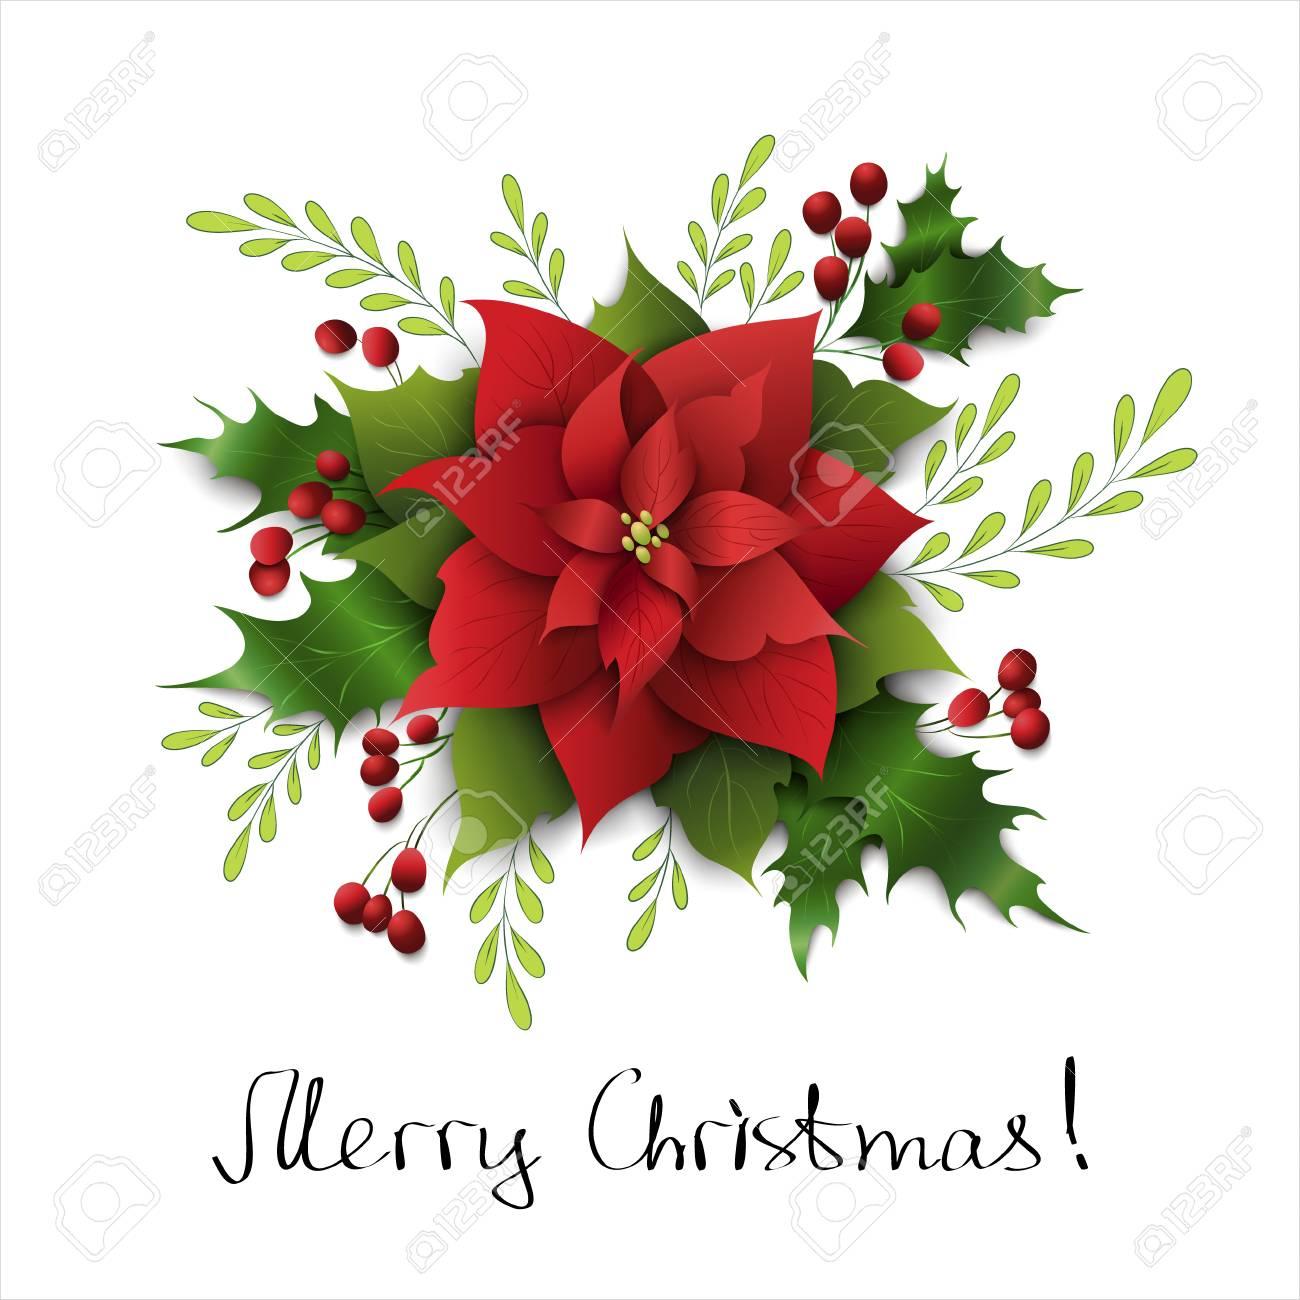 Disegni Di Natale Vettoriali.Priorita Bassa Di Disegno Di Natale Con Stella Di Natale E Vischio